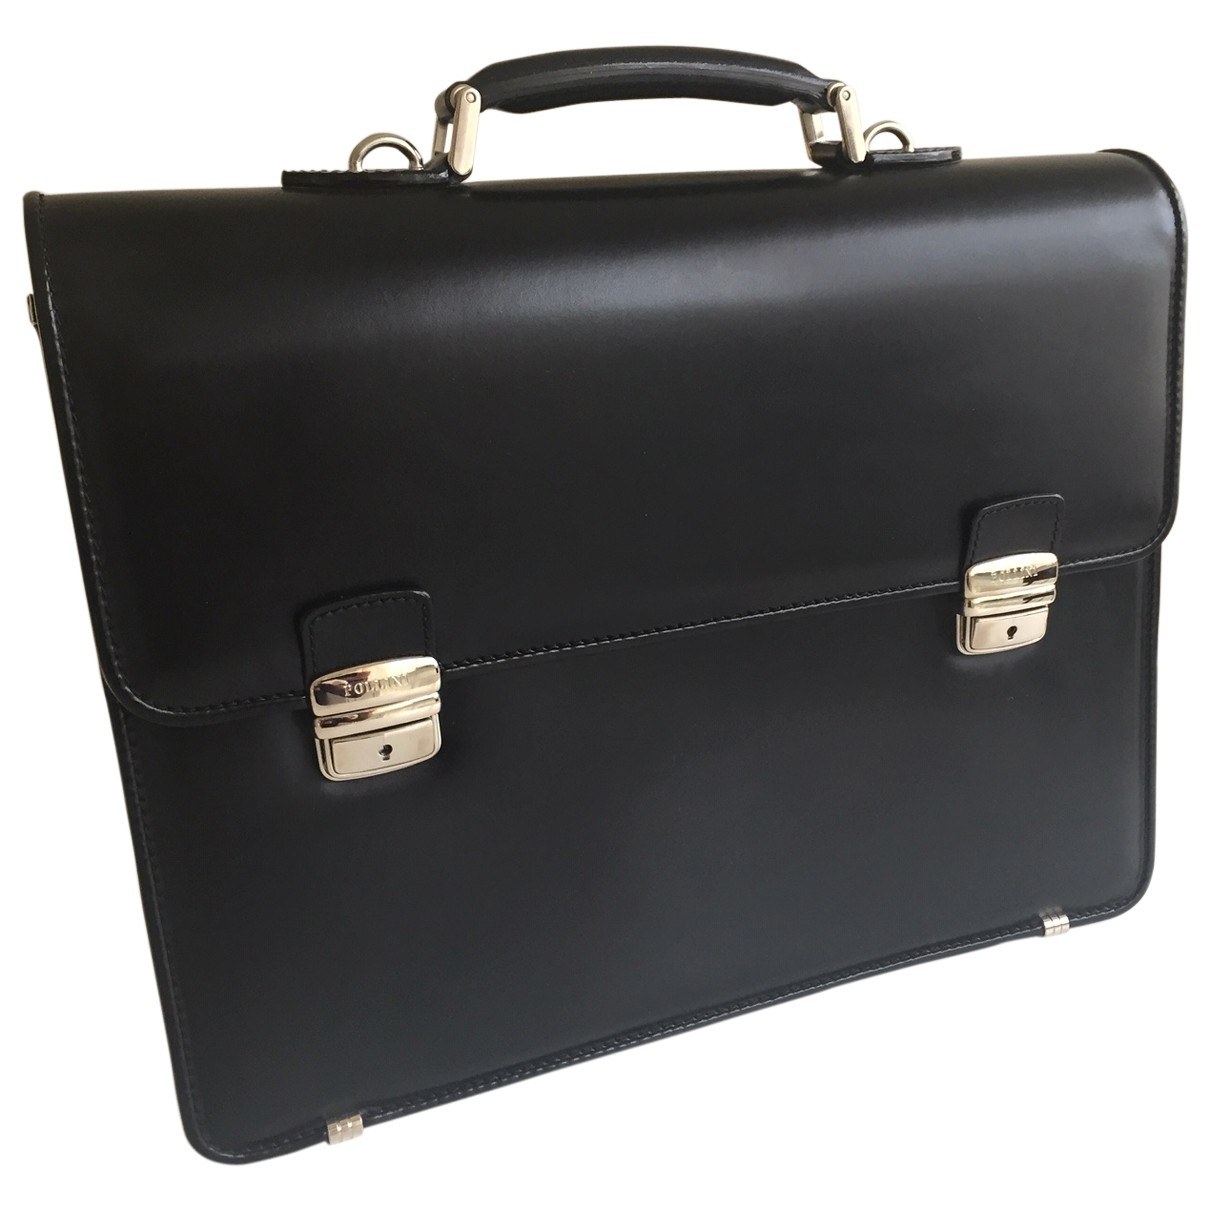 Pollini \N Black Leather bag for Men \N